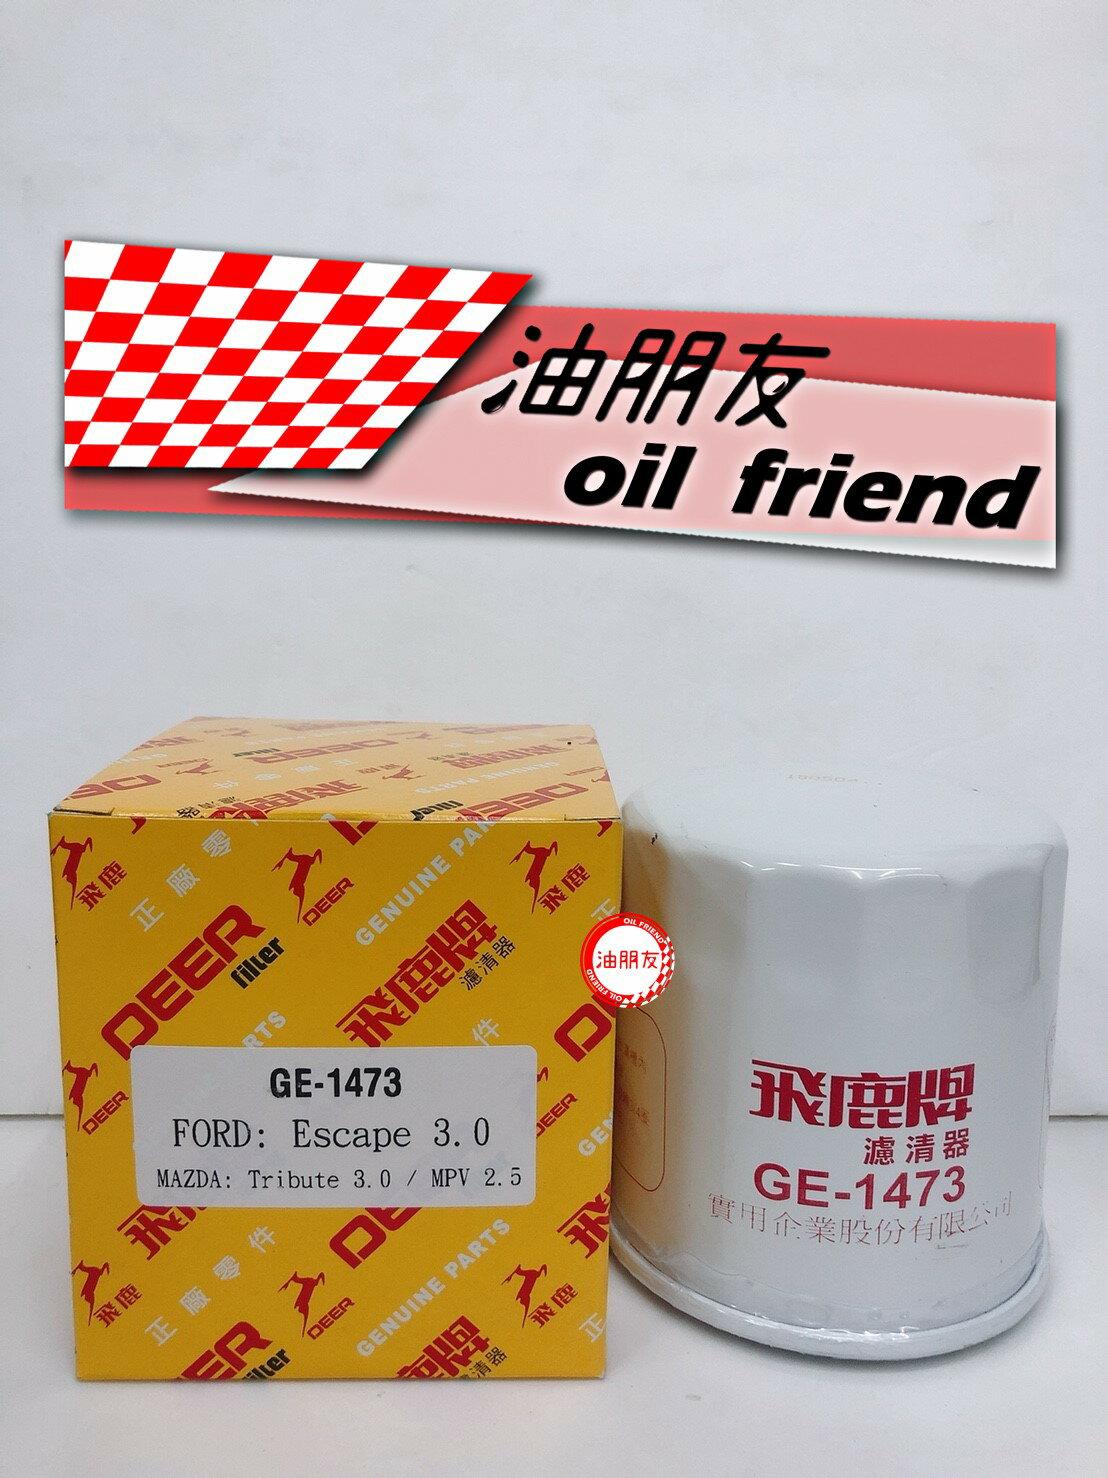 -油朋友- 飛鹿 FORD 福特 ESCAPE 3.0 機油芯 機油濾心 機油濾網 GE-1473 ge1473